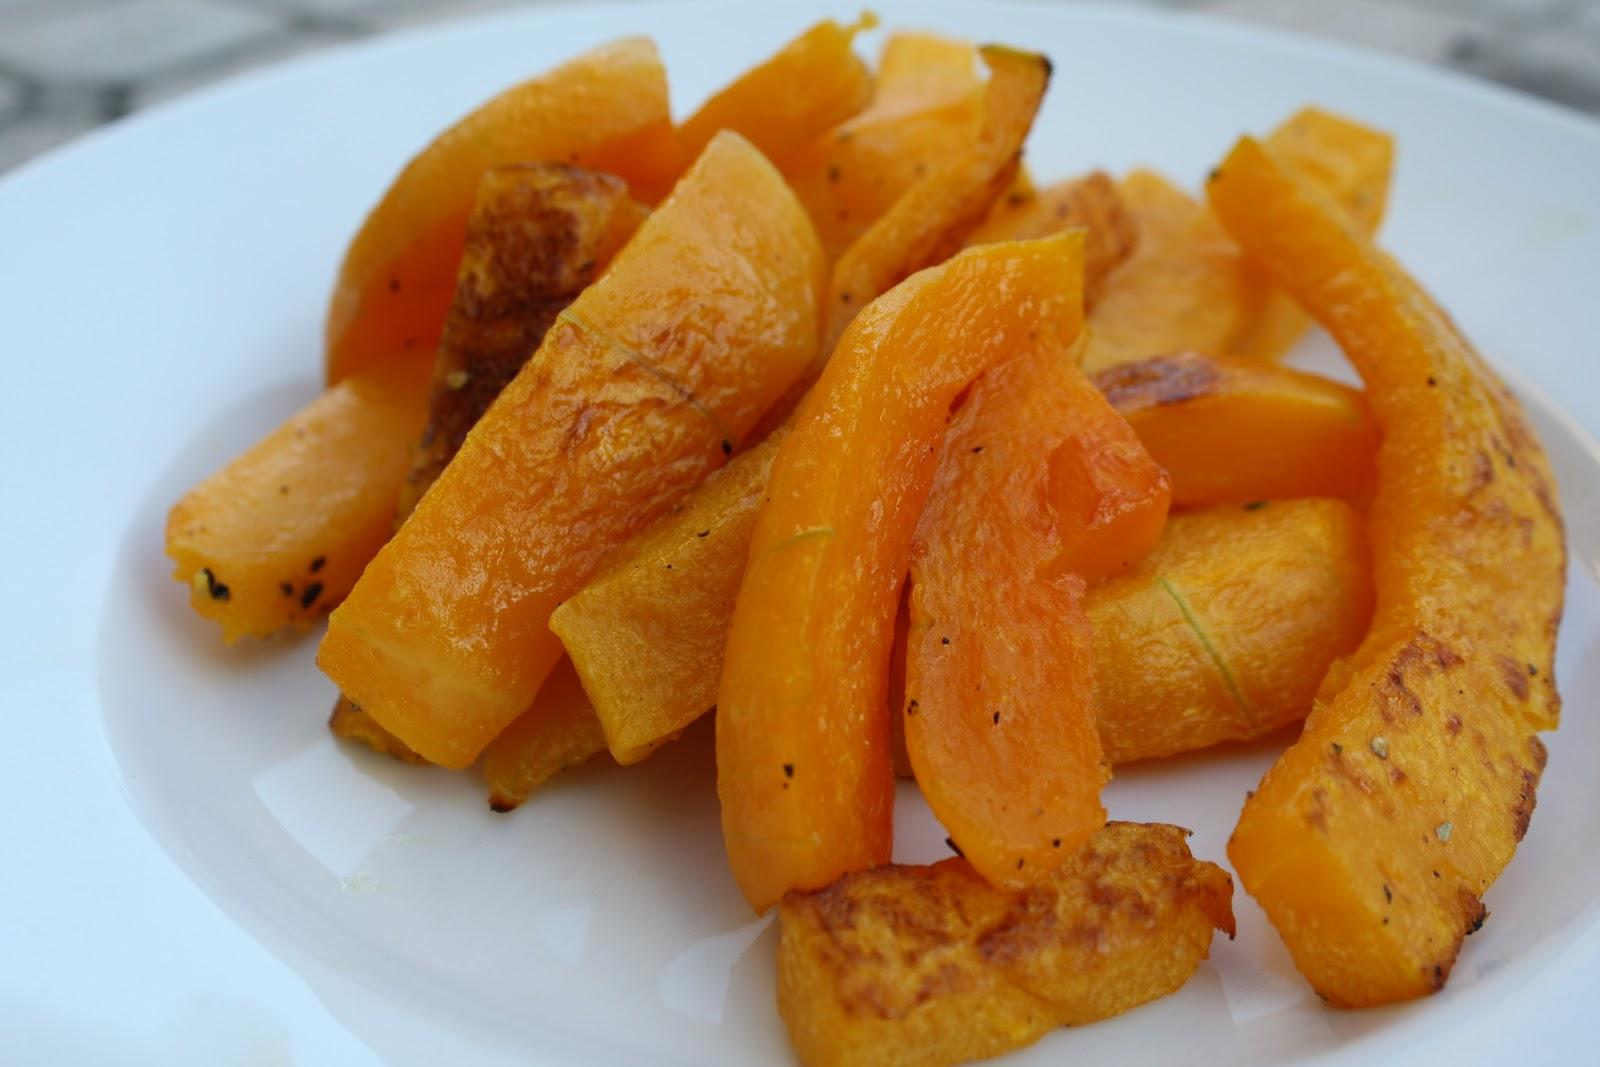 Lauren's Menu: Butternut Squash Fries